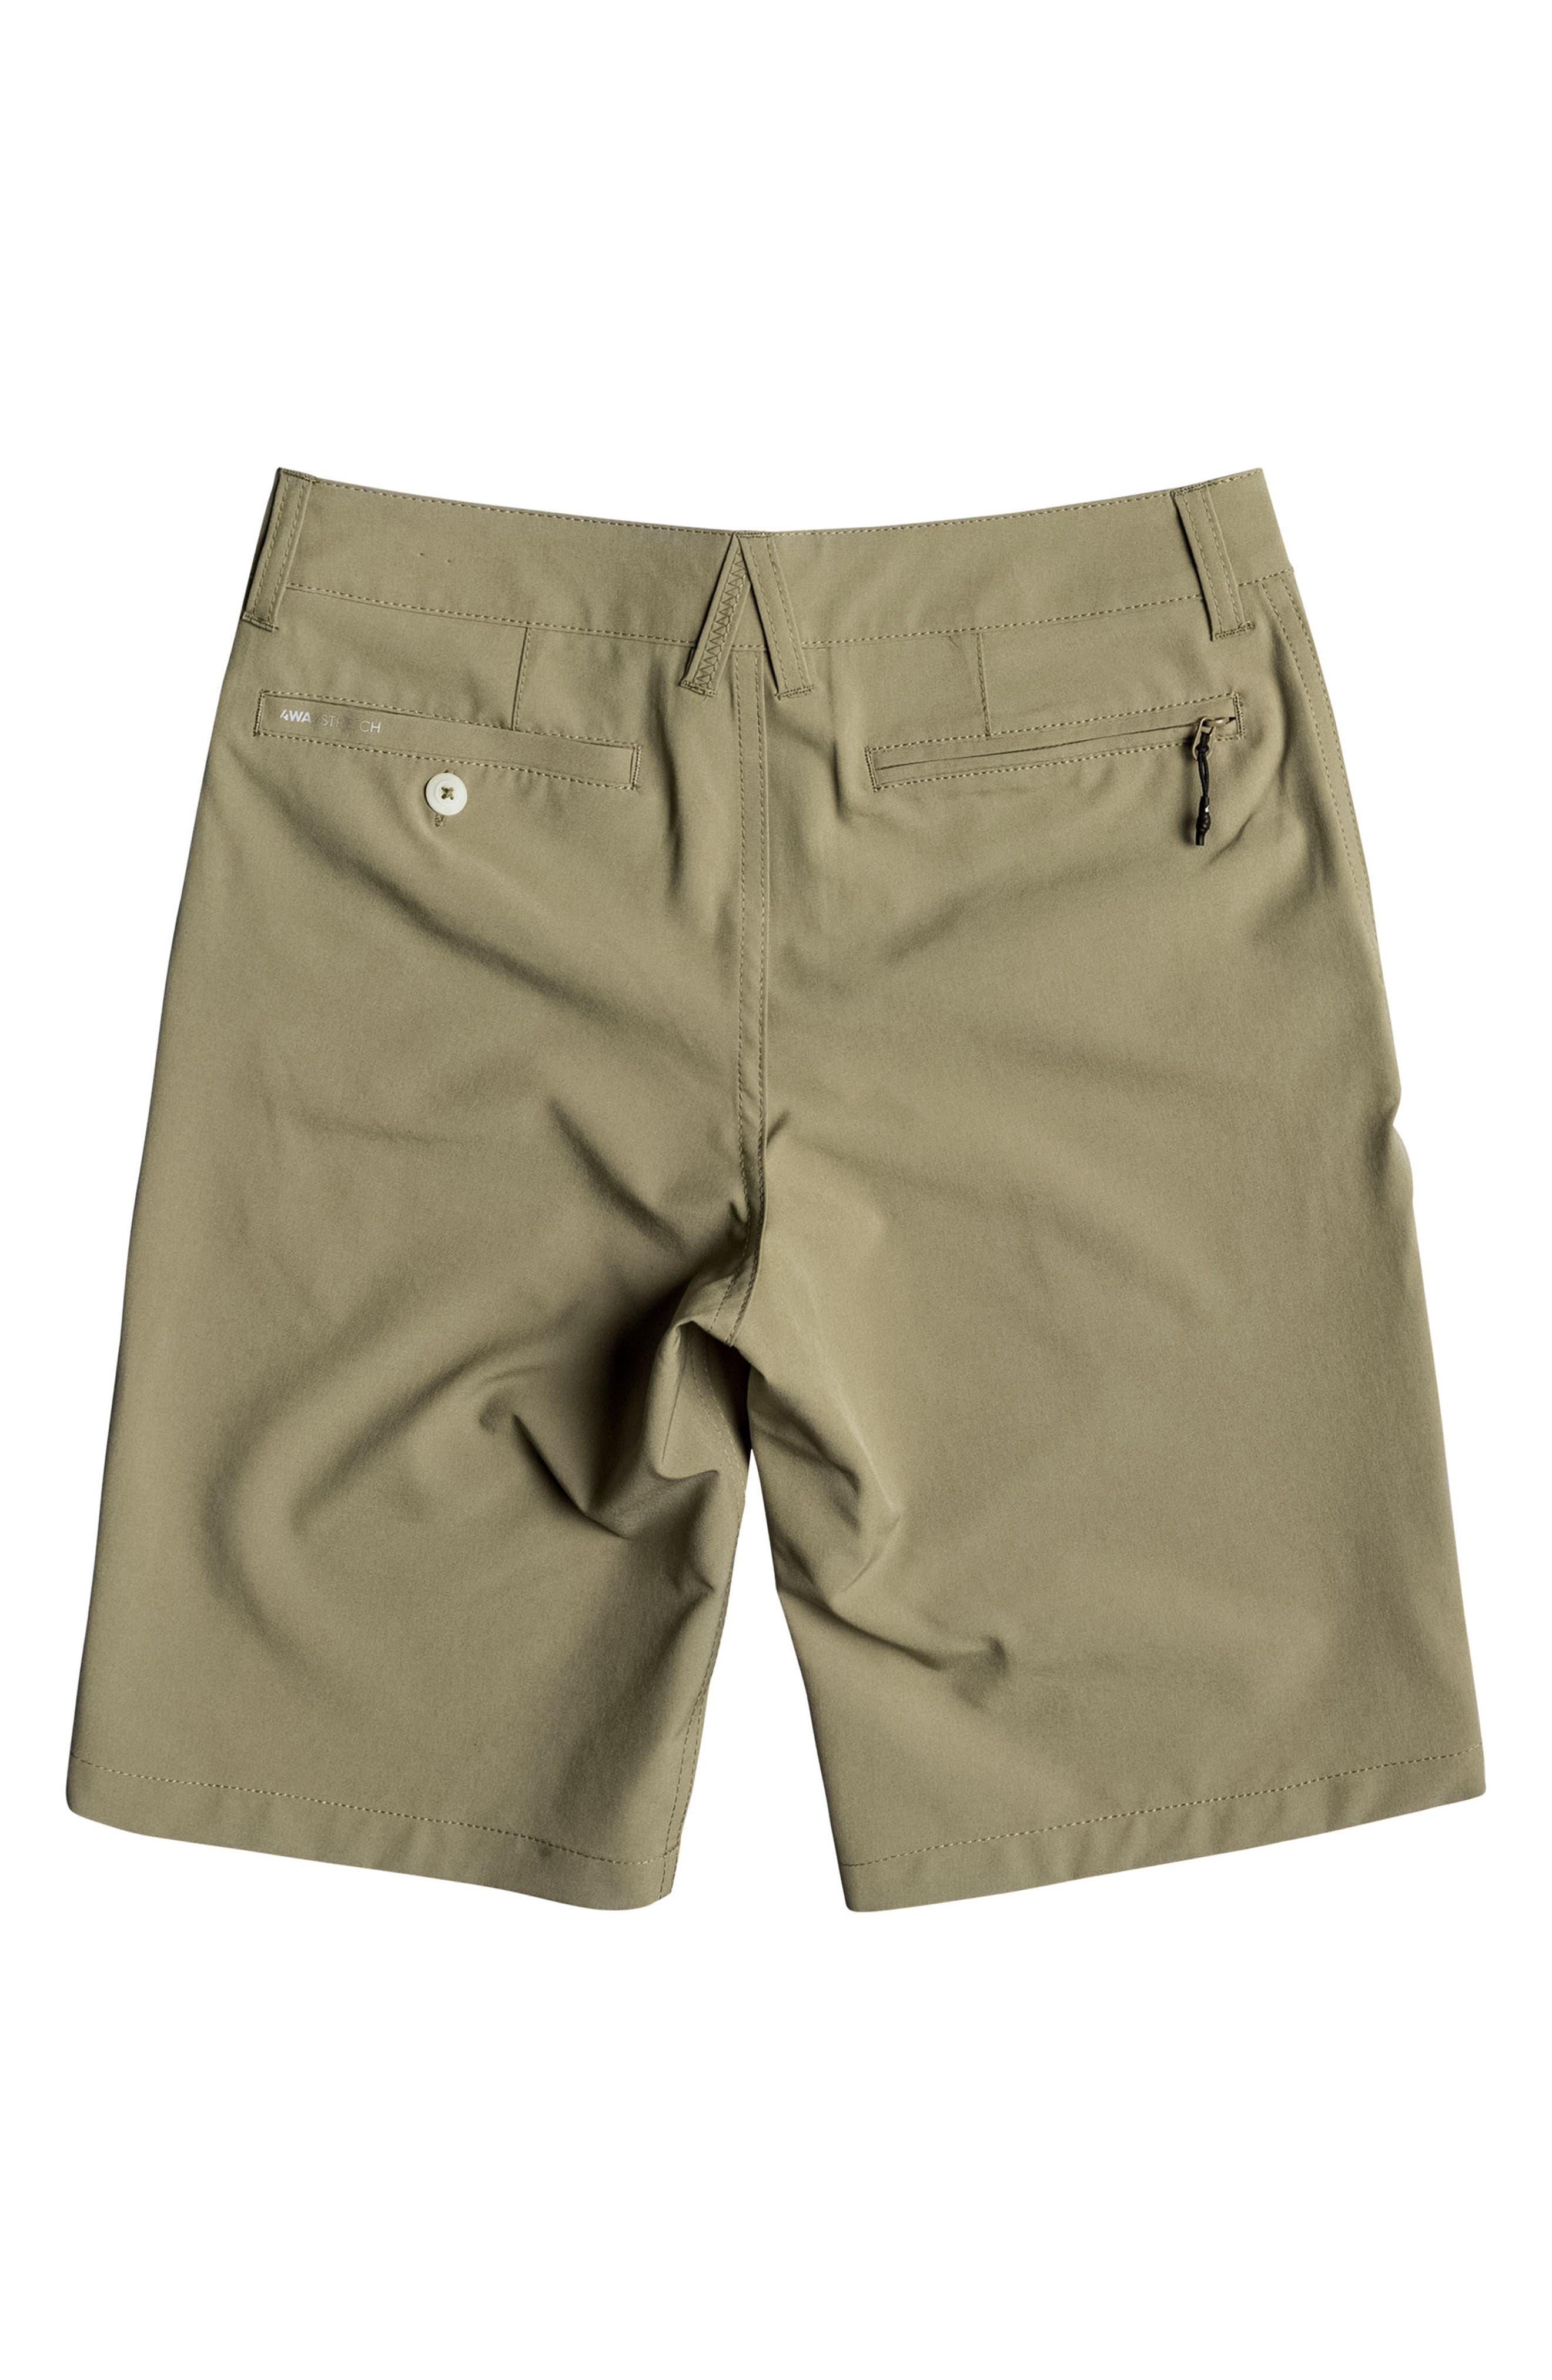 Union Amphibian Board Shorts,                             Alternate thumbnail 7, color,